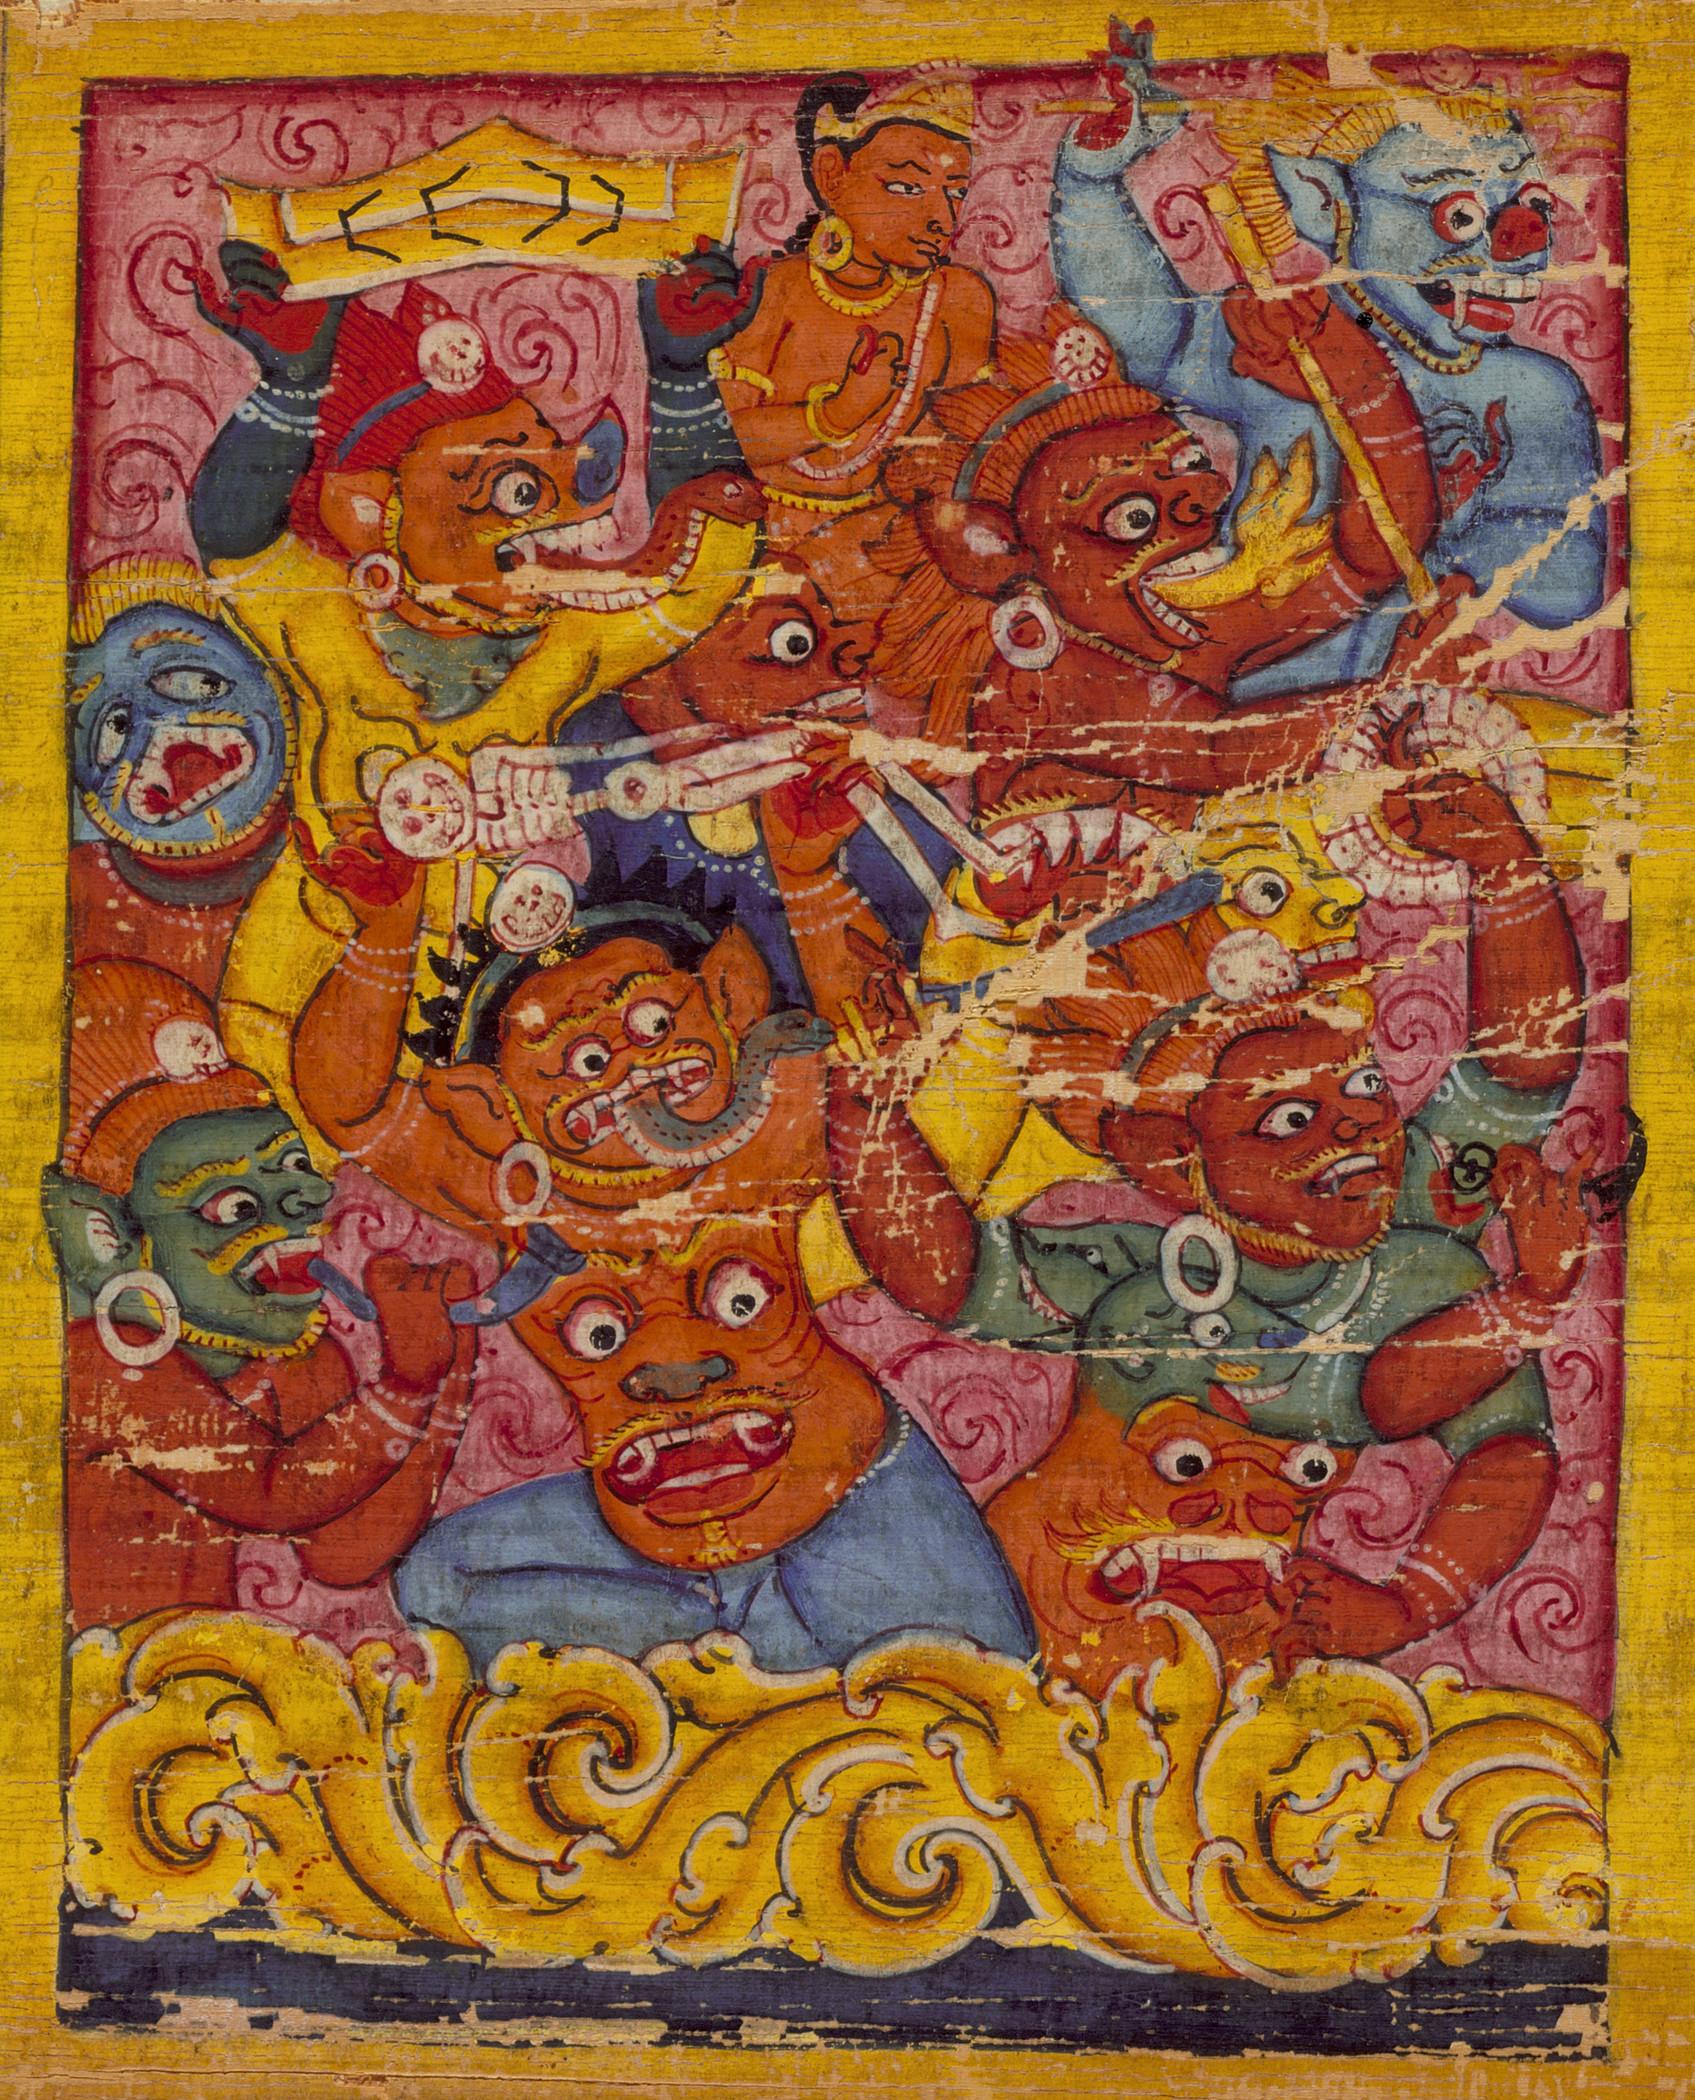 Mara's Retinue, Folio from an Ashtasahasrika Prajnaparamita (The Perfection of Wisdom in 8,000 Verses). 11th century. Nepal.  LACMA .